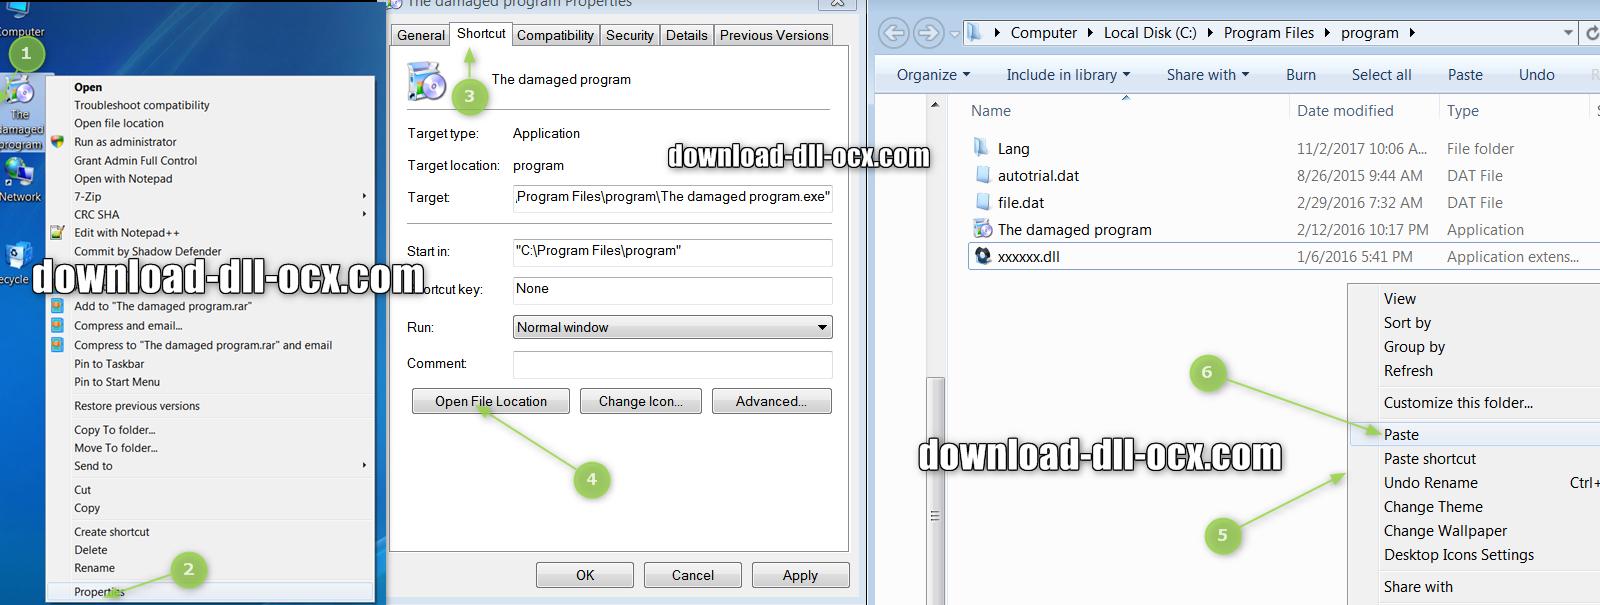 how to install Reg4msdoc645mi.dll file? for fix missing